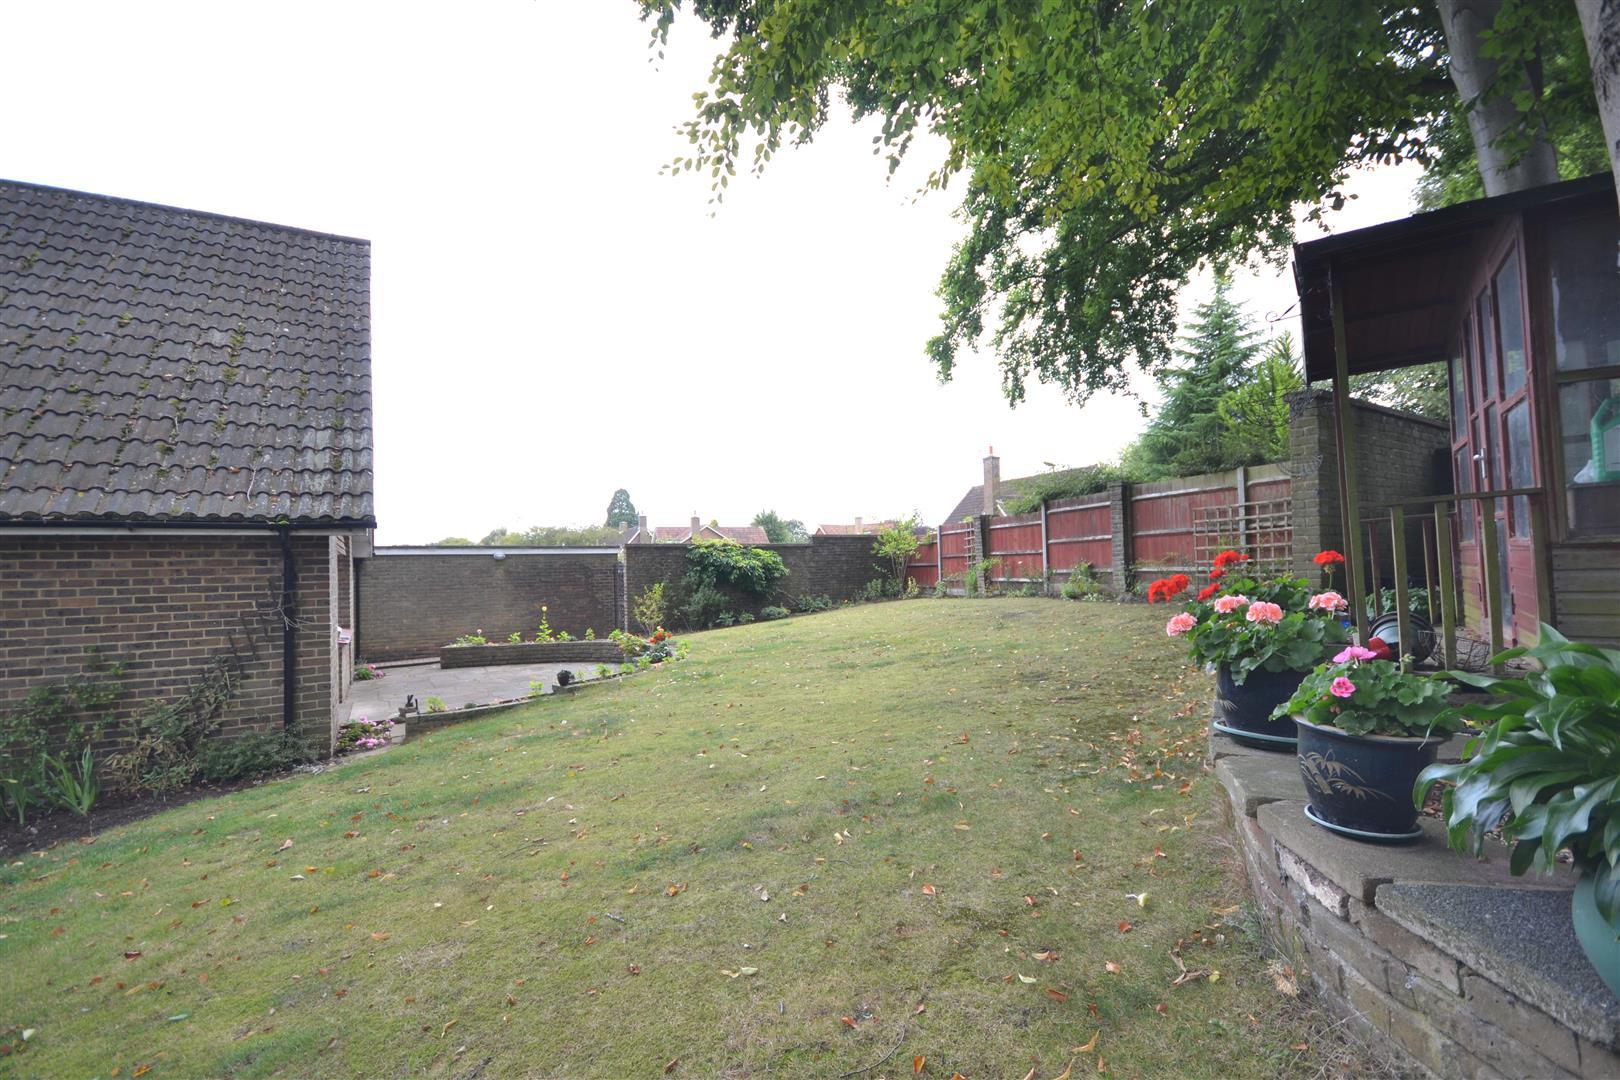 treadwell road garden 3.JPG